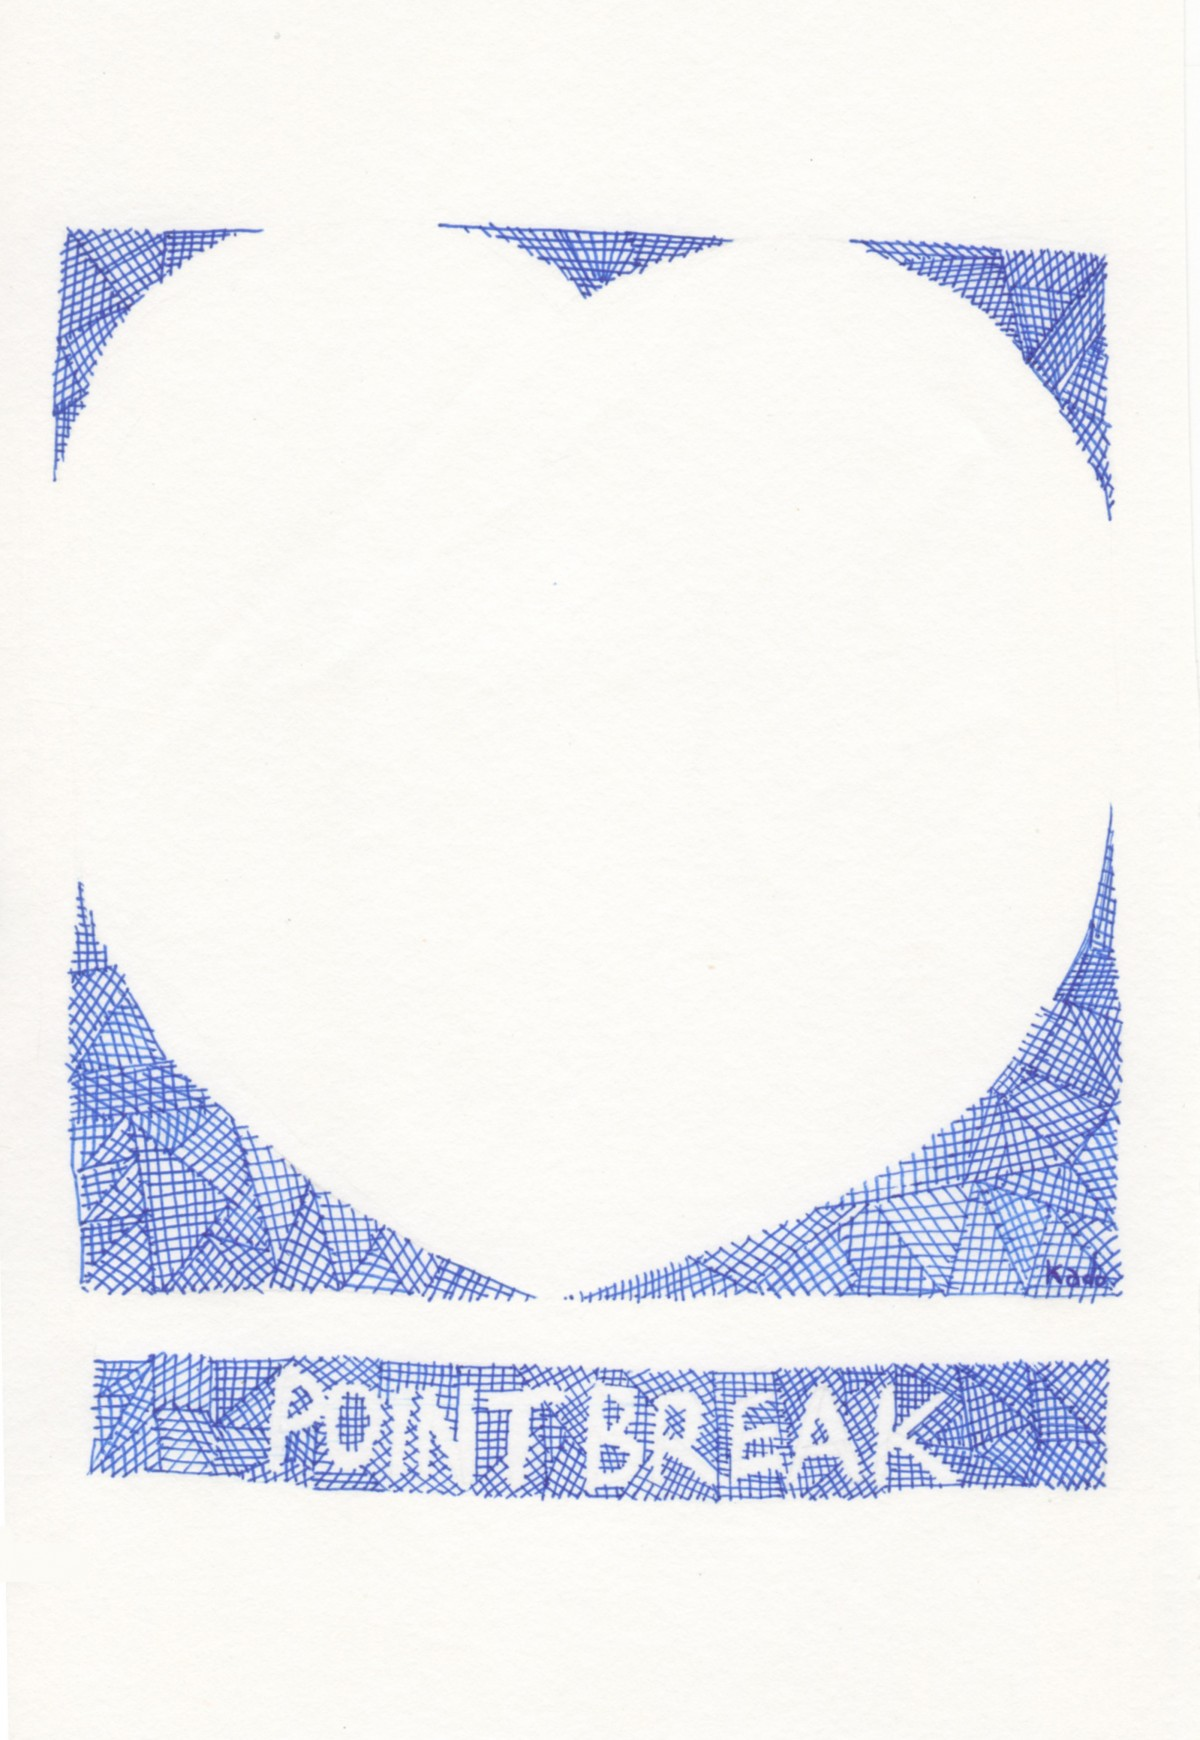 9_pointbreak